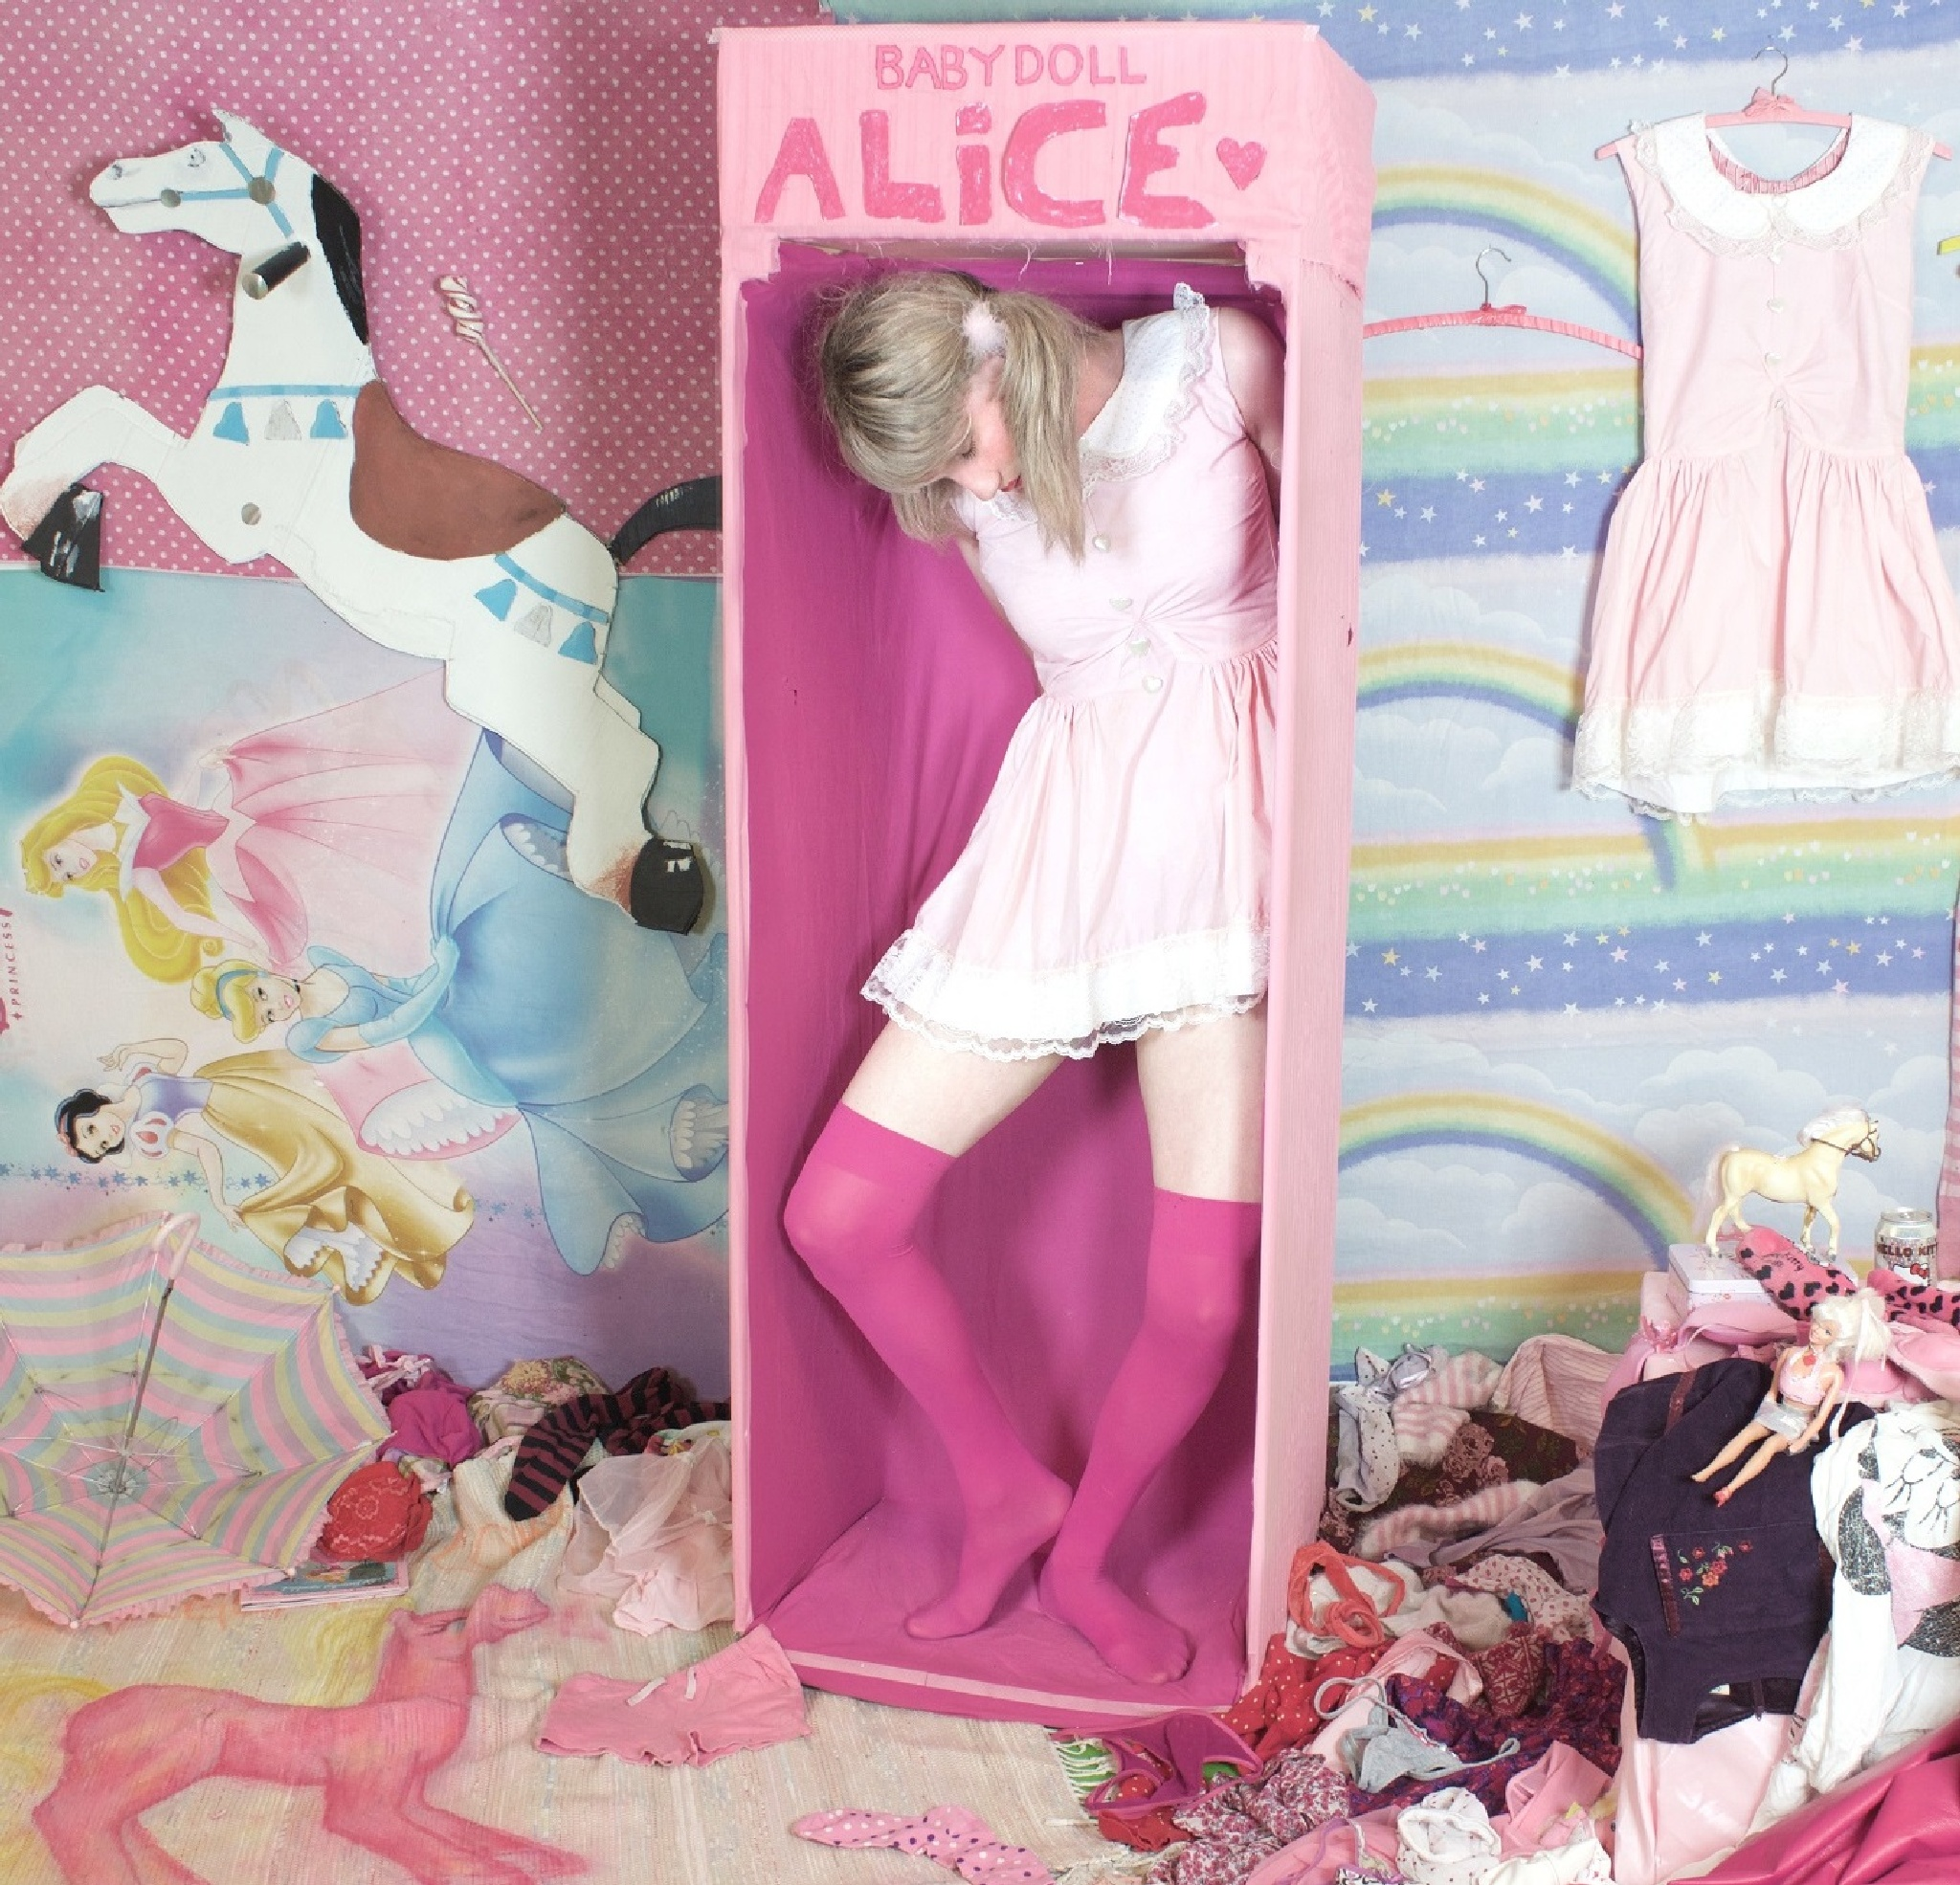 Baby-doll Alice by Alice Söderlund